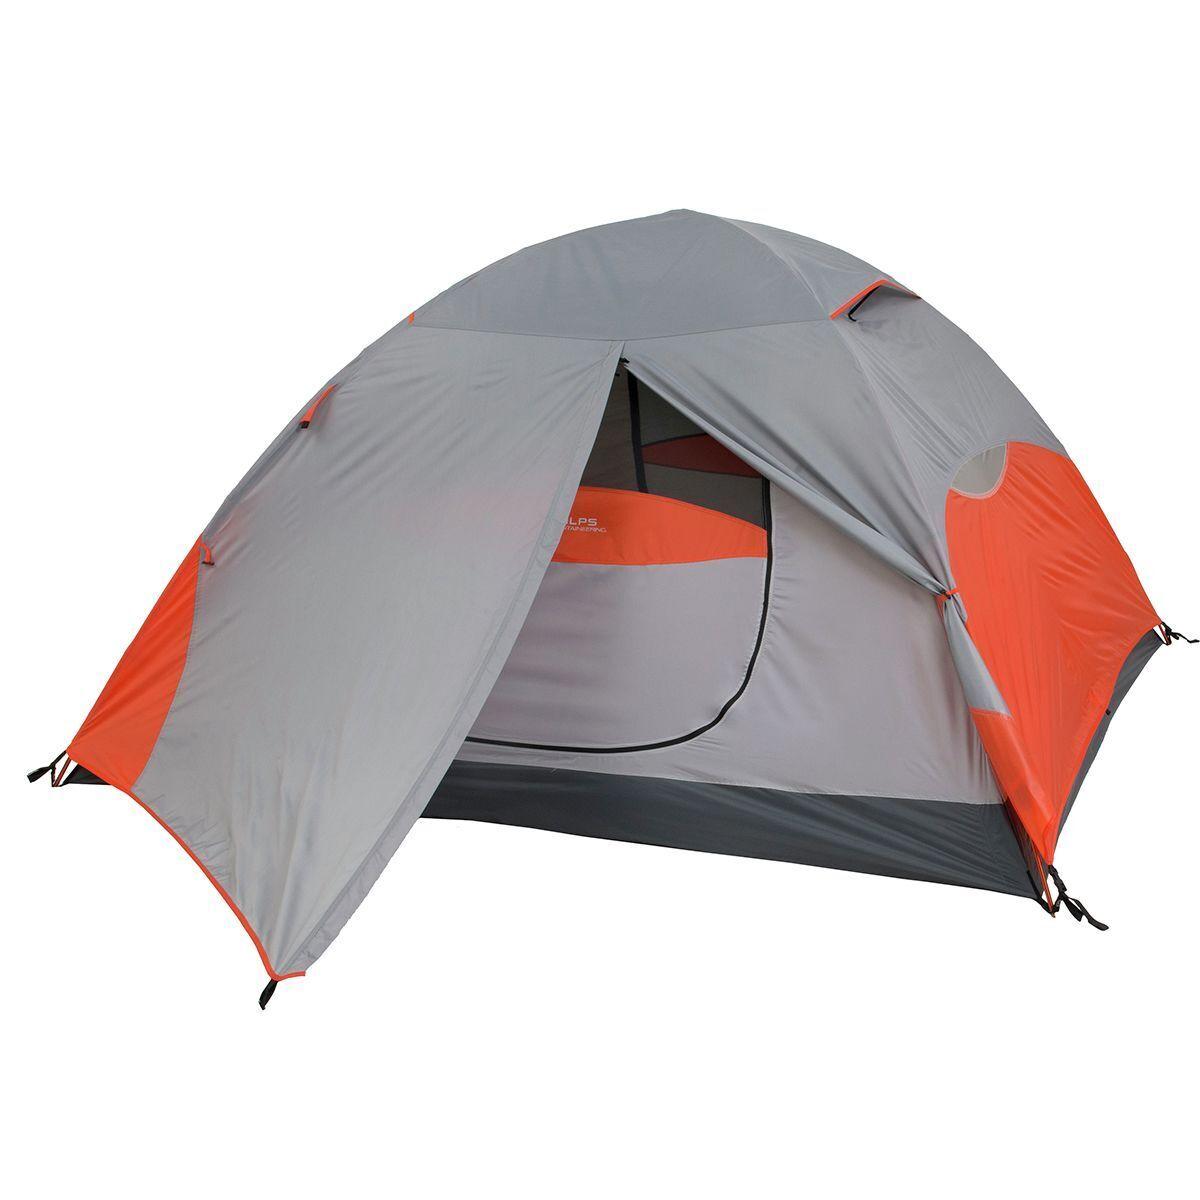 ba472b09e1 ALPS Mountaineering Koda 3 Tent: 3-Person 3-Season | eBay